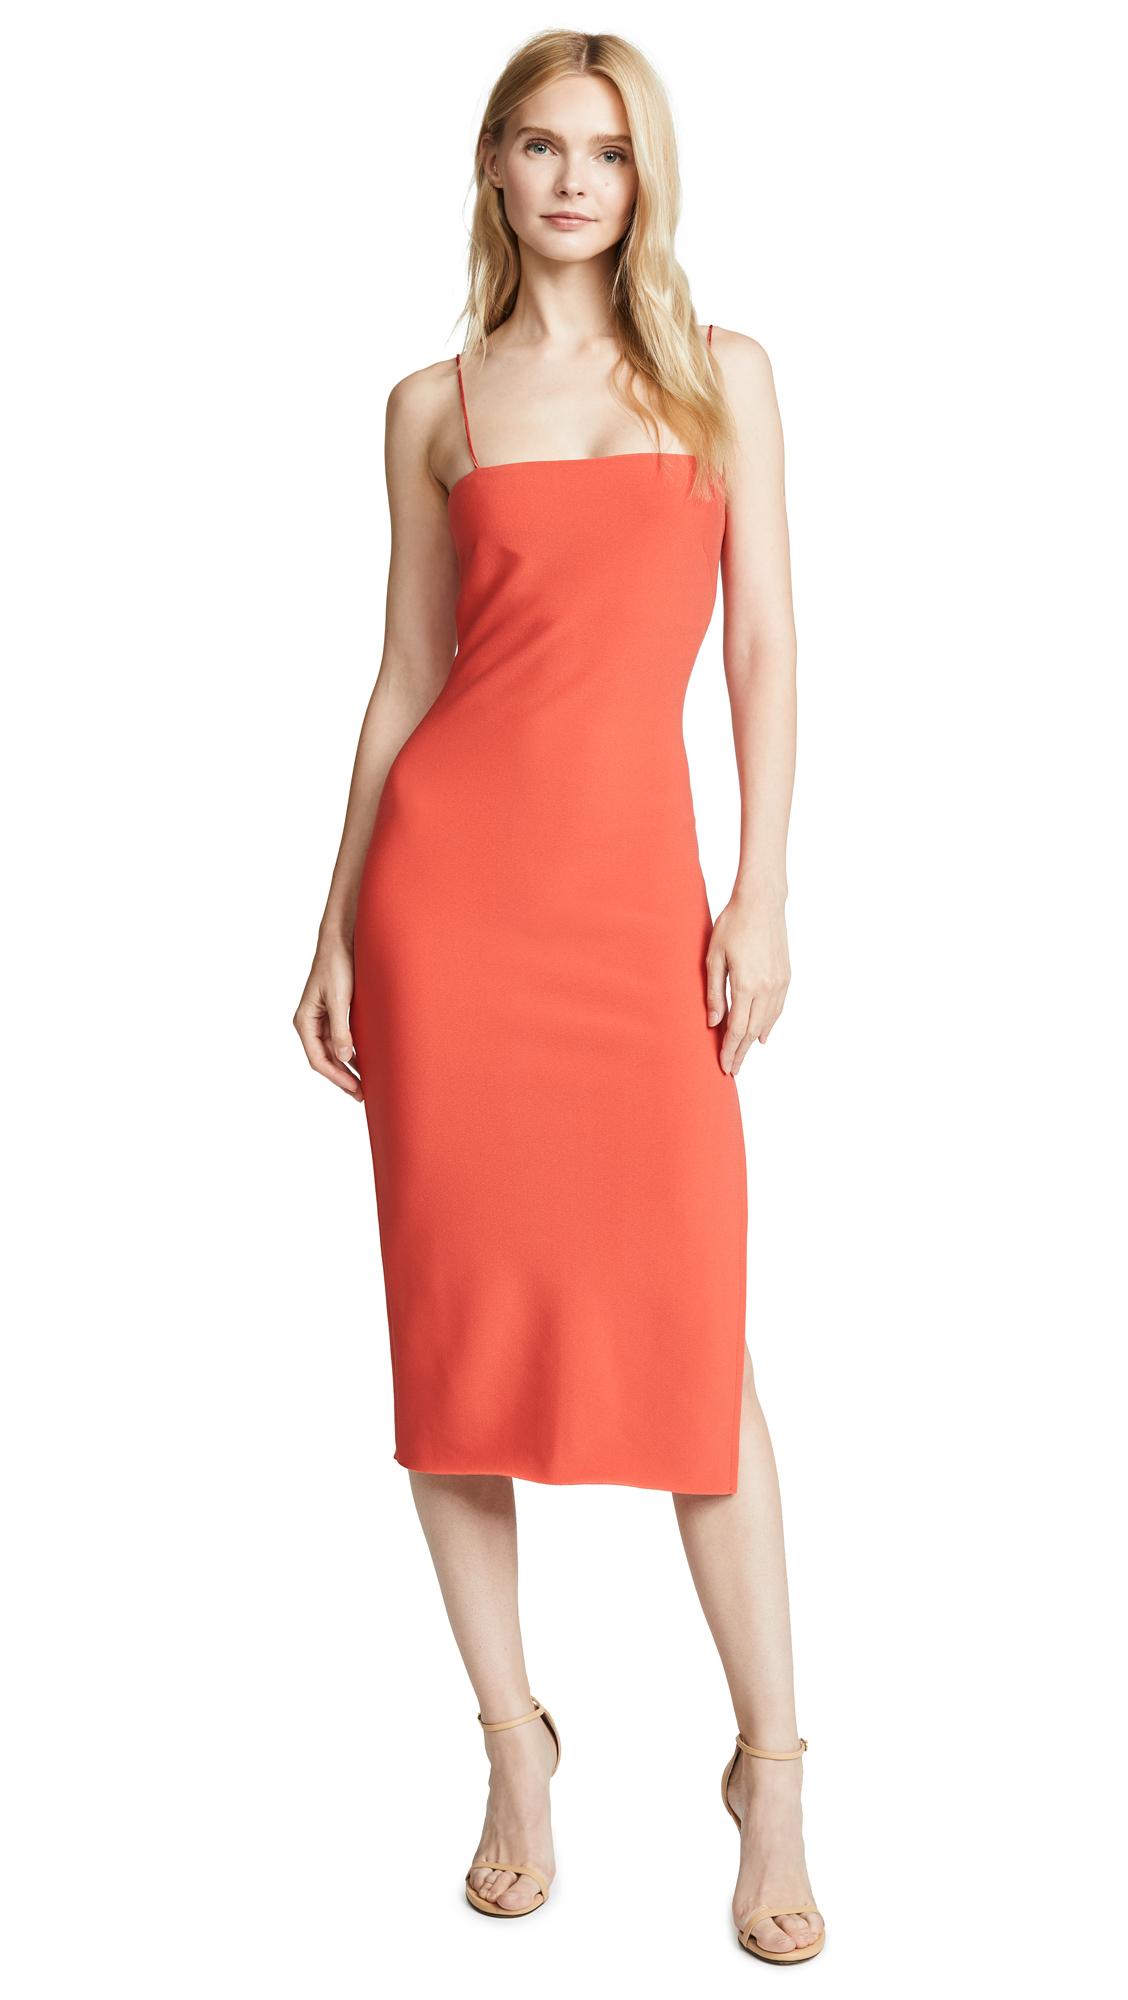 Bec & Bridge Dreamgirl Slim Midi Dress - Red